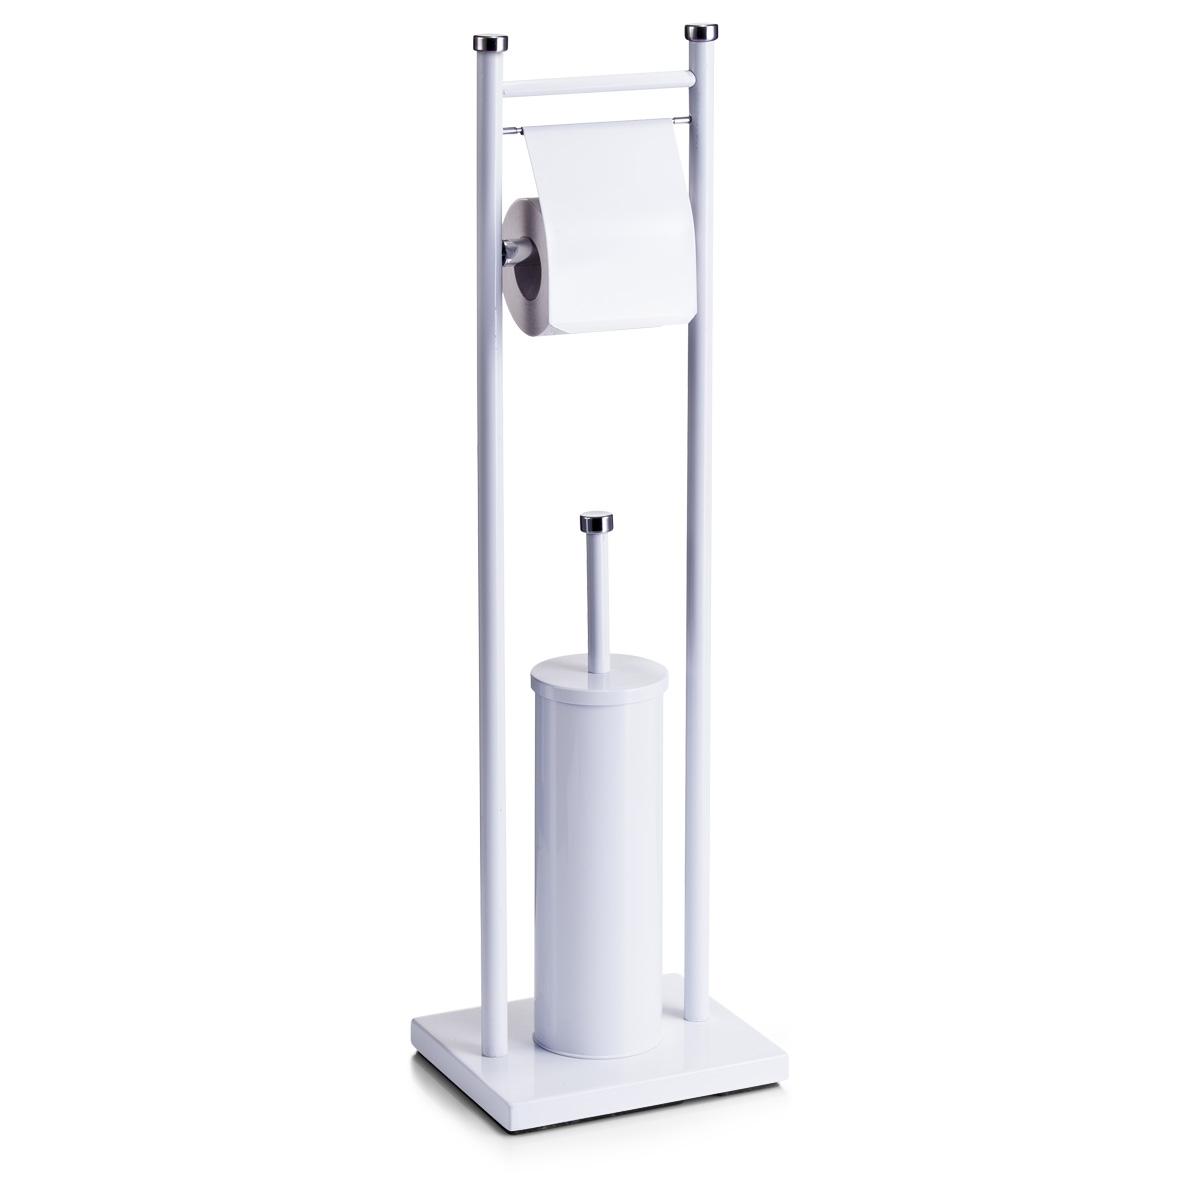 Suport pentru hartie igienica si perie de toaleta, Metal White, l22xA18xH76 cm din categoria Baie